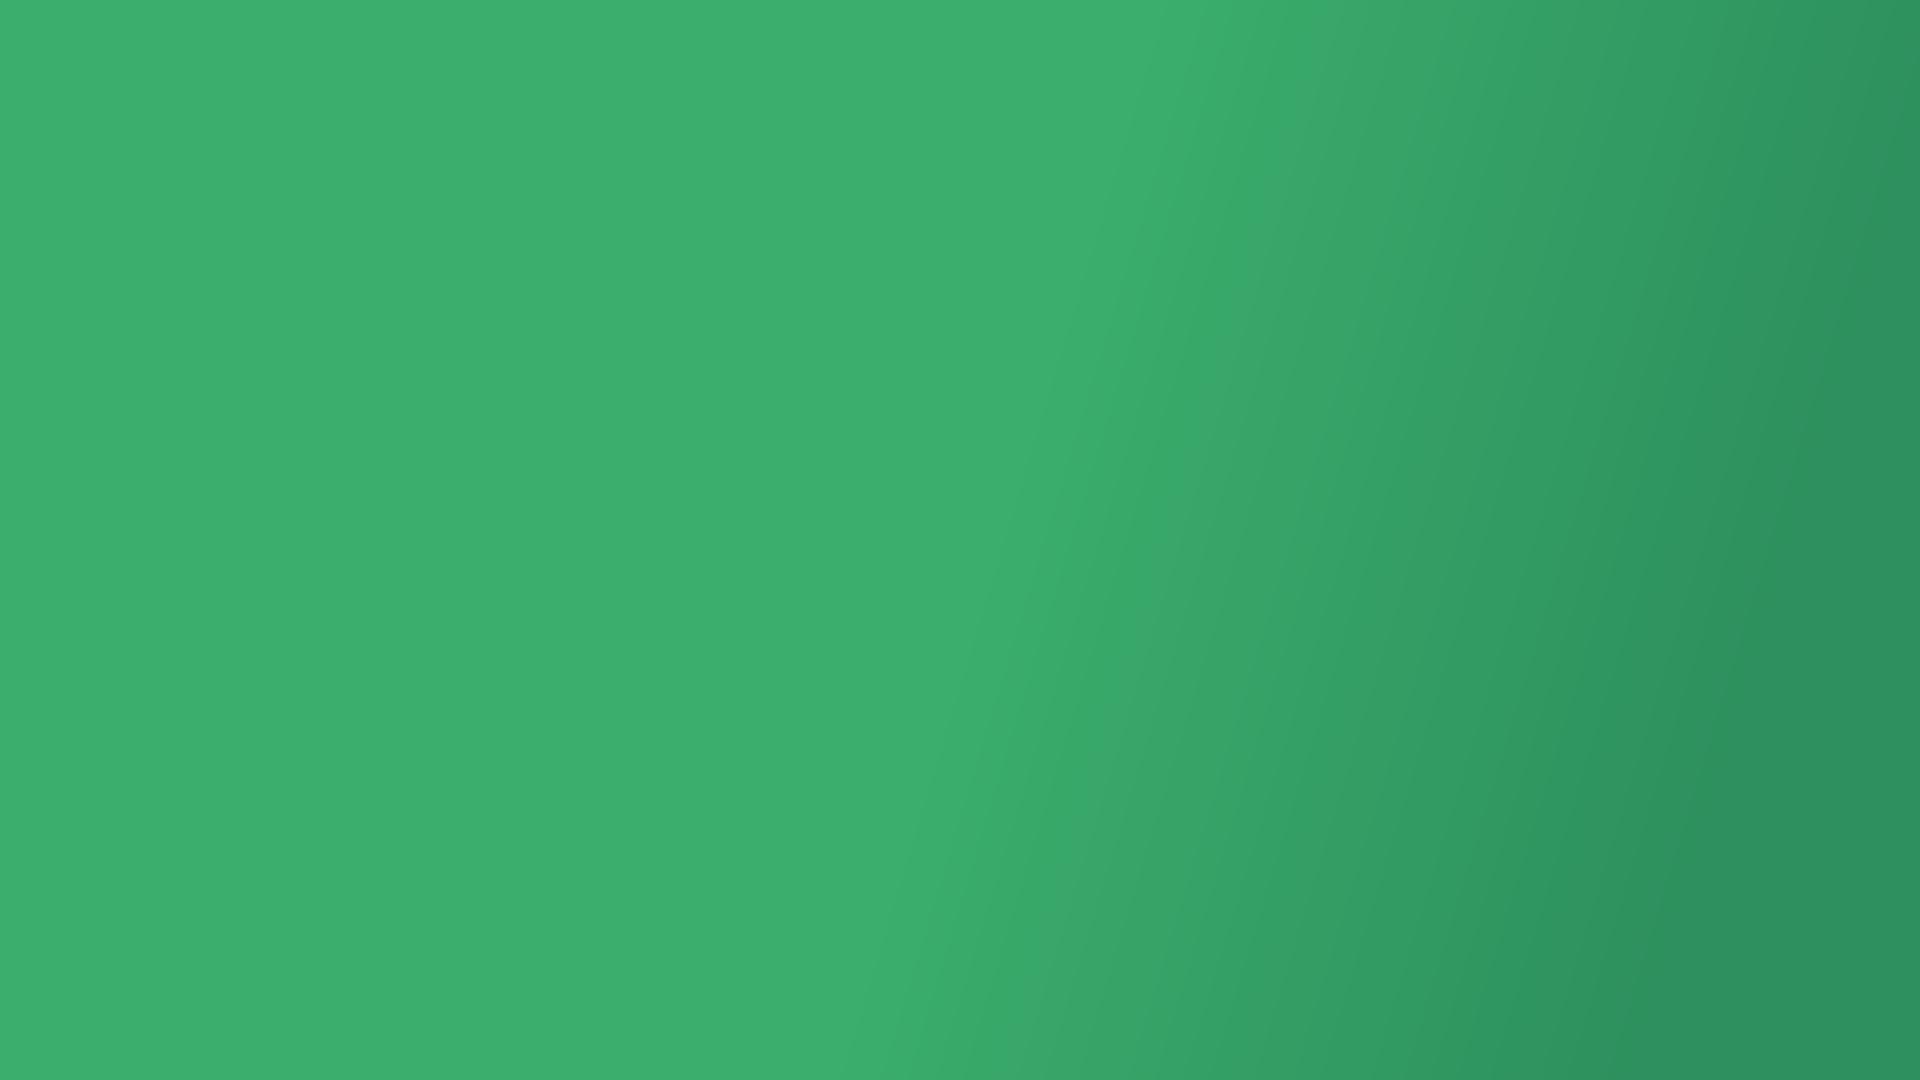 Green-Green Gradient